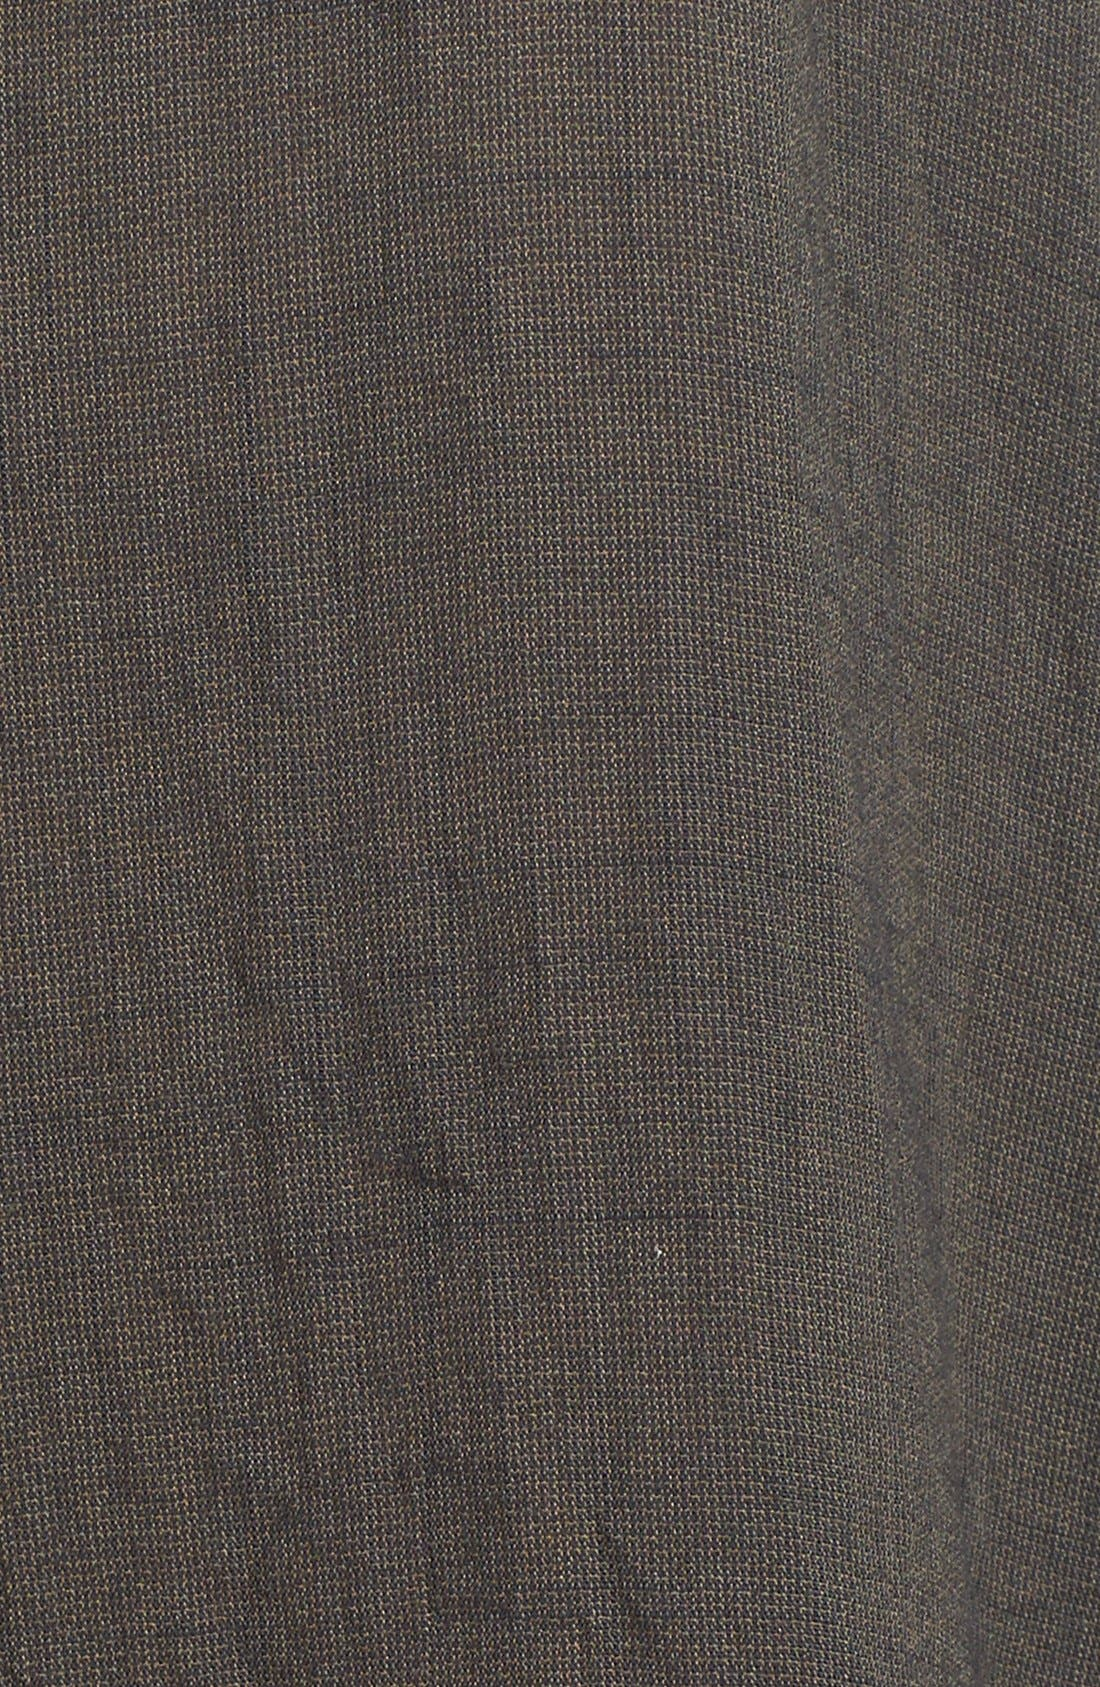 'That's a Wrap' Shirt,                             Alternate thumbnail 6, color,                             001